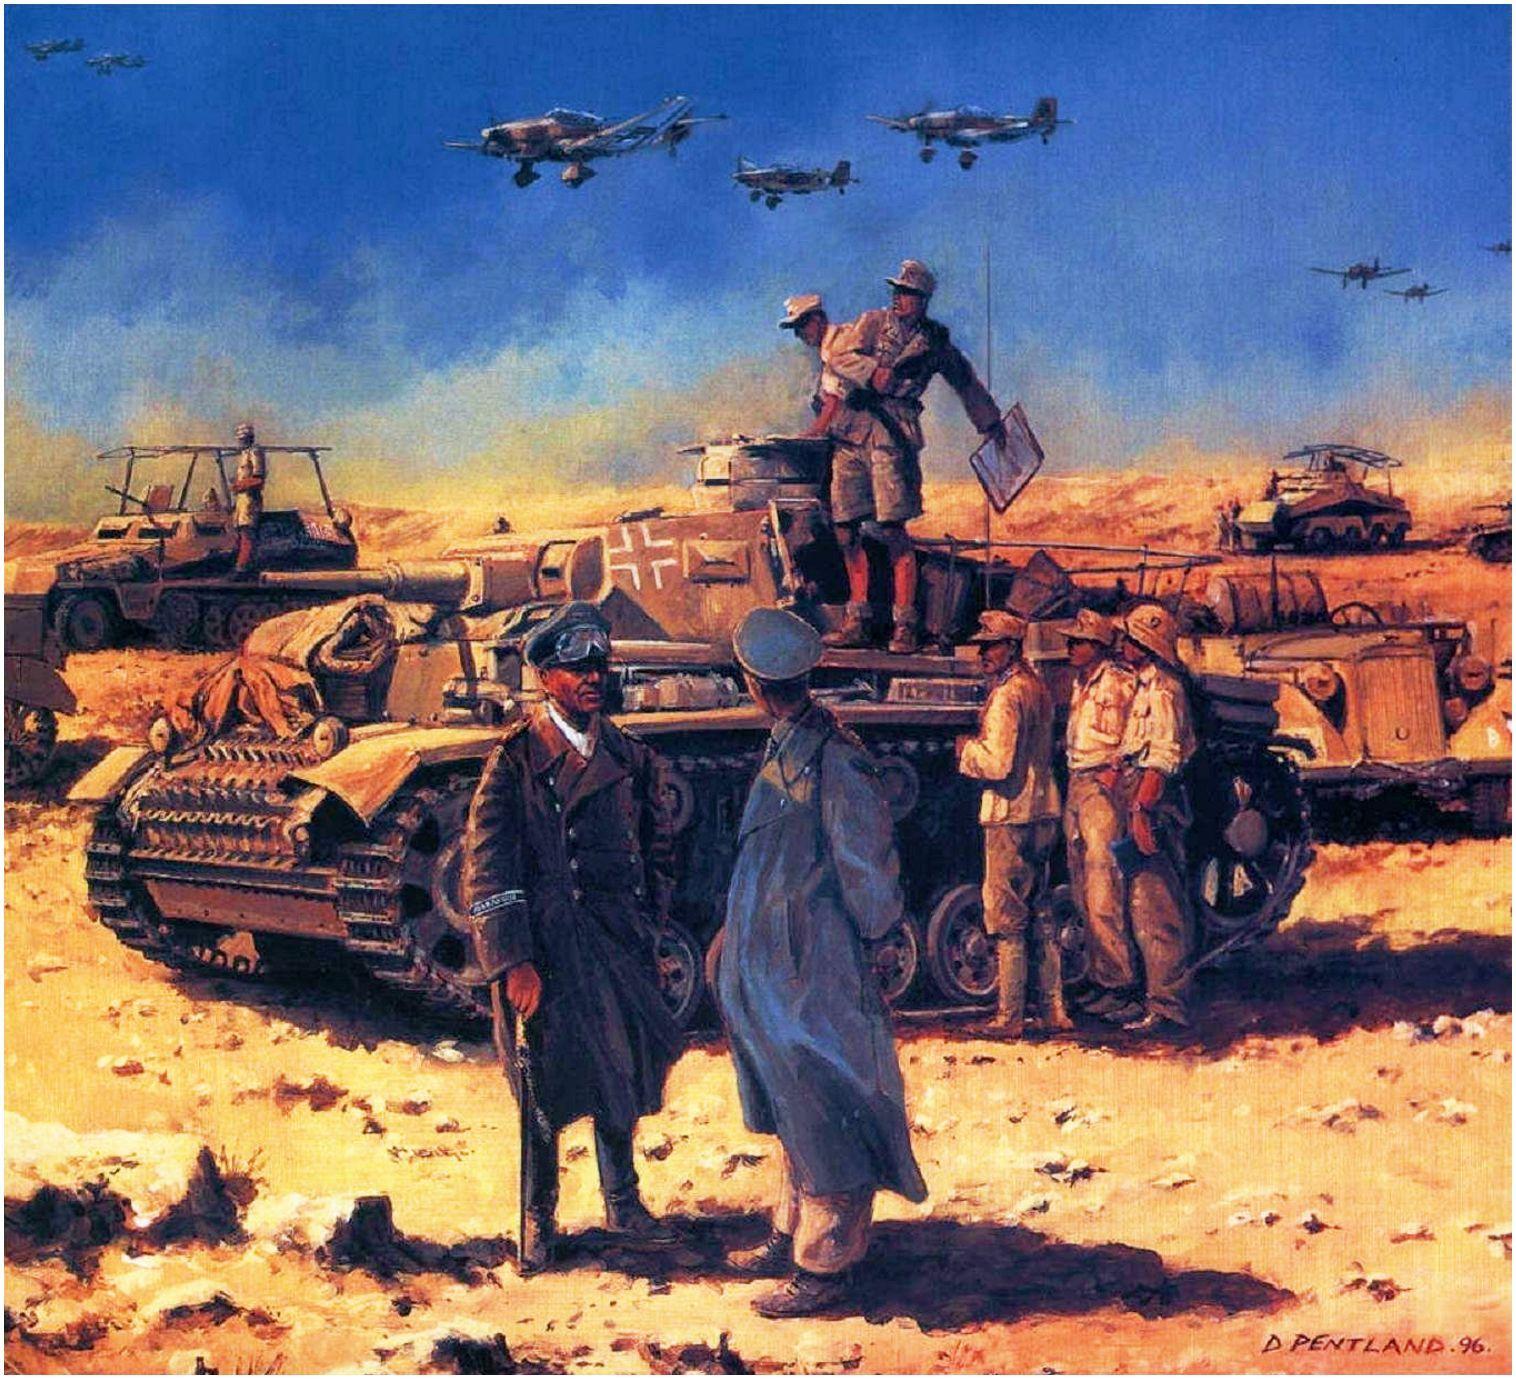 The Desert Fox (El zorro del desierto). Rommel en la segunda batalla de El Alamein, Egipto, 1942. David Pentland